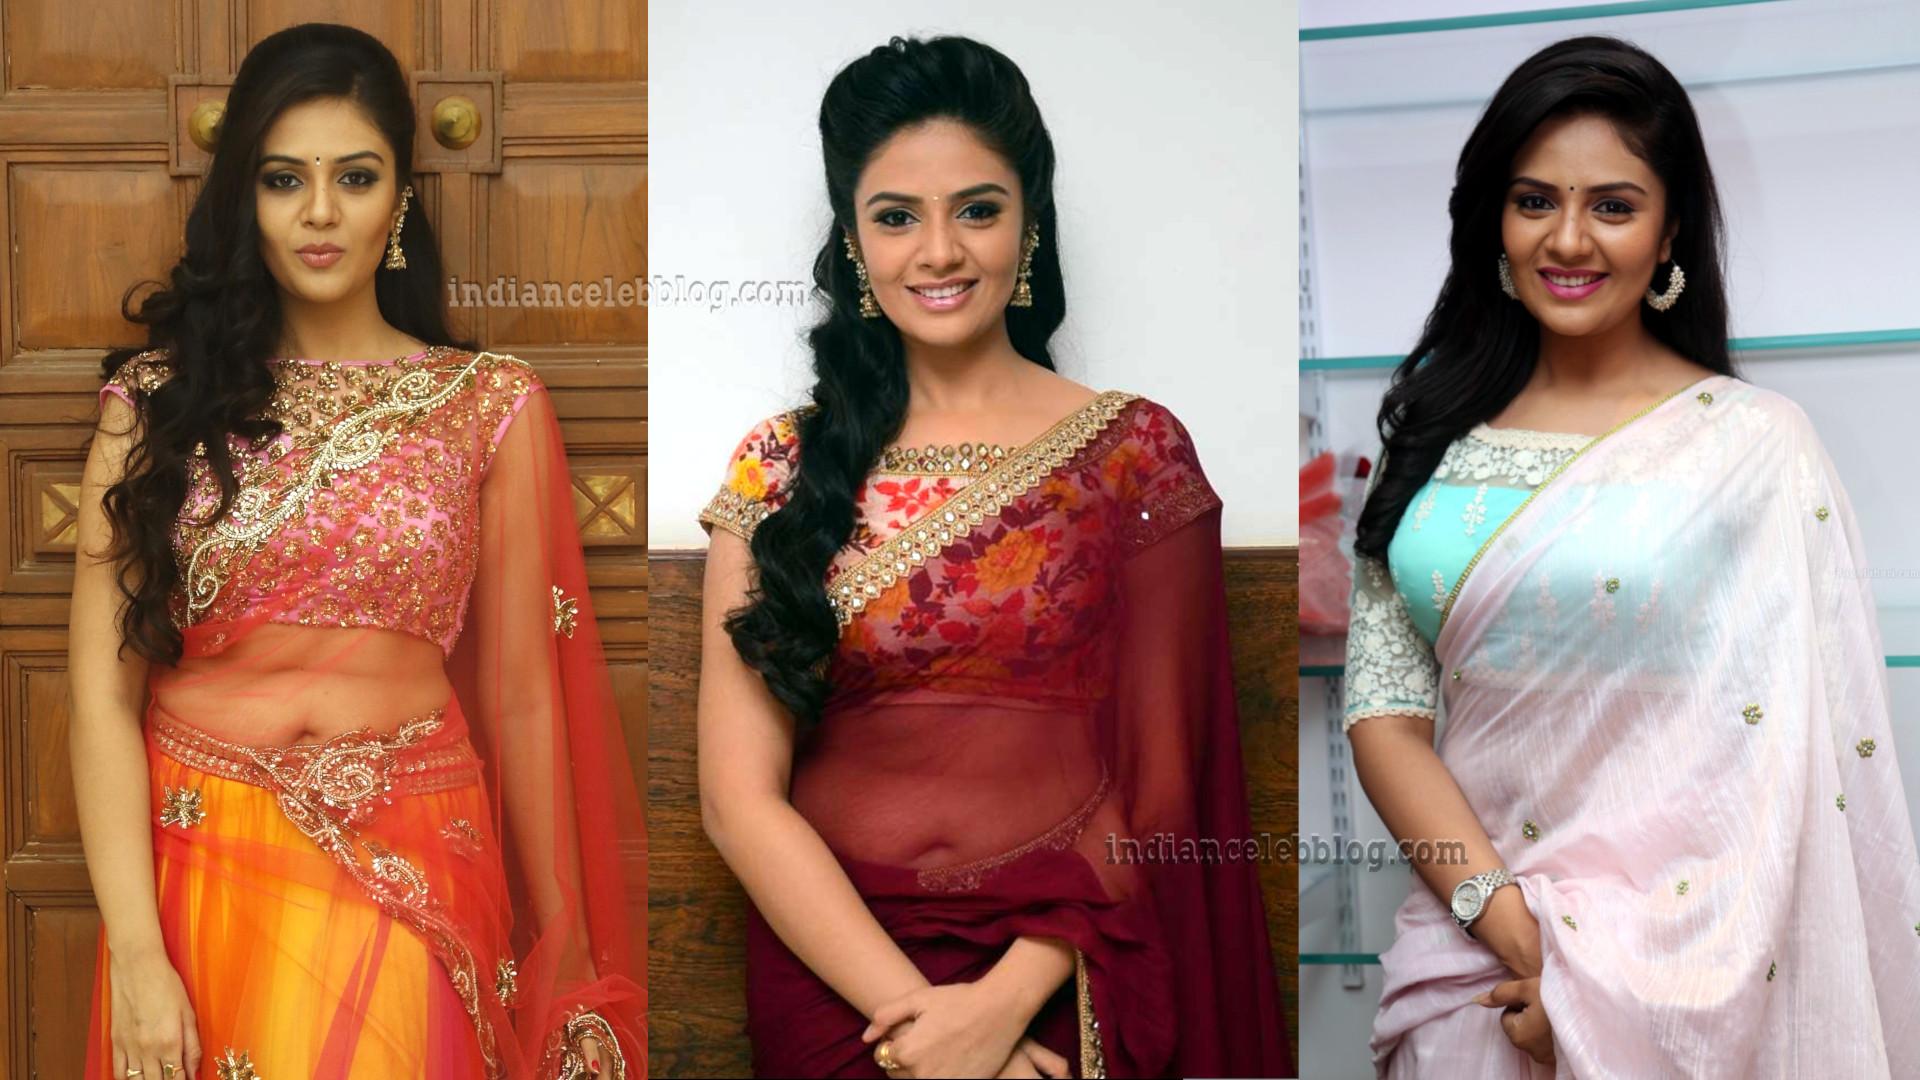 Sreemukhi Telugu TV Anchor transparent saree photos